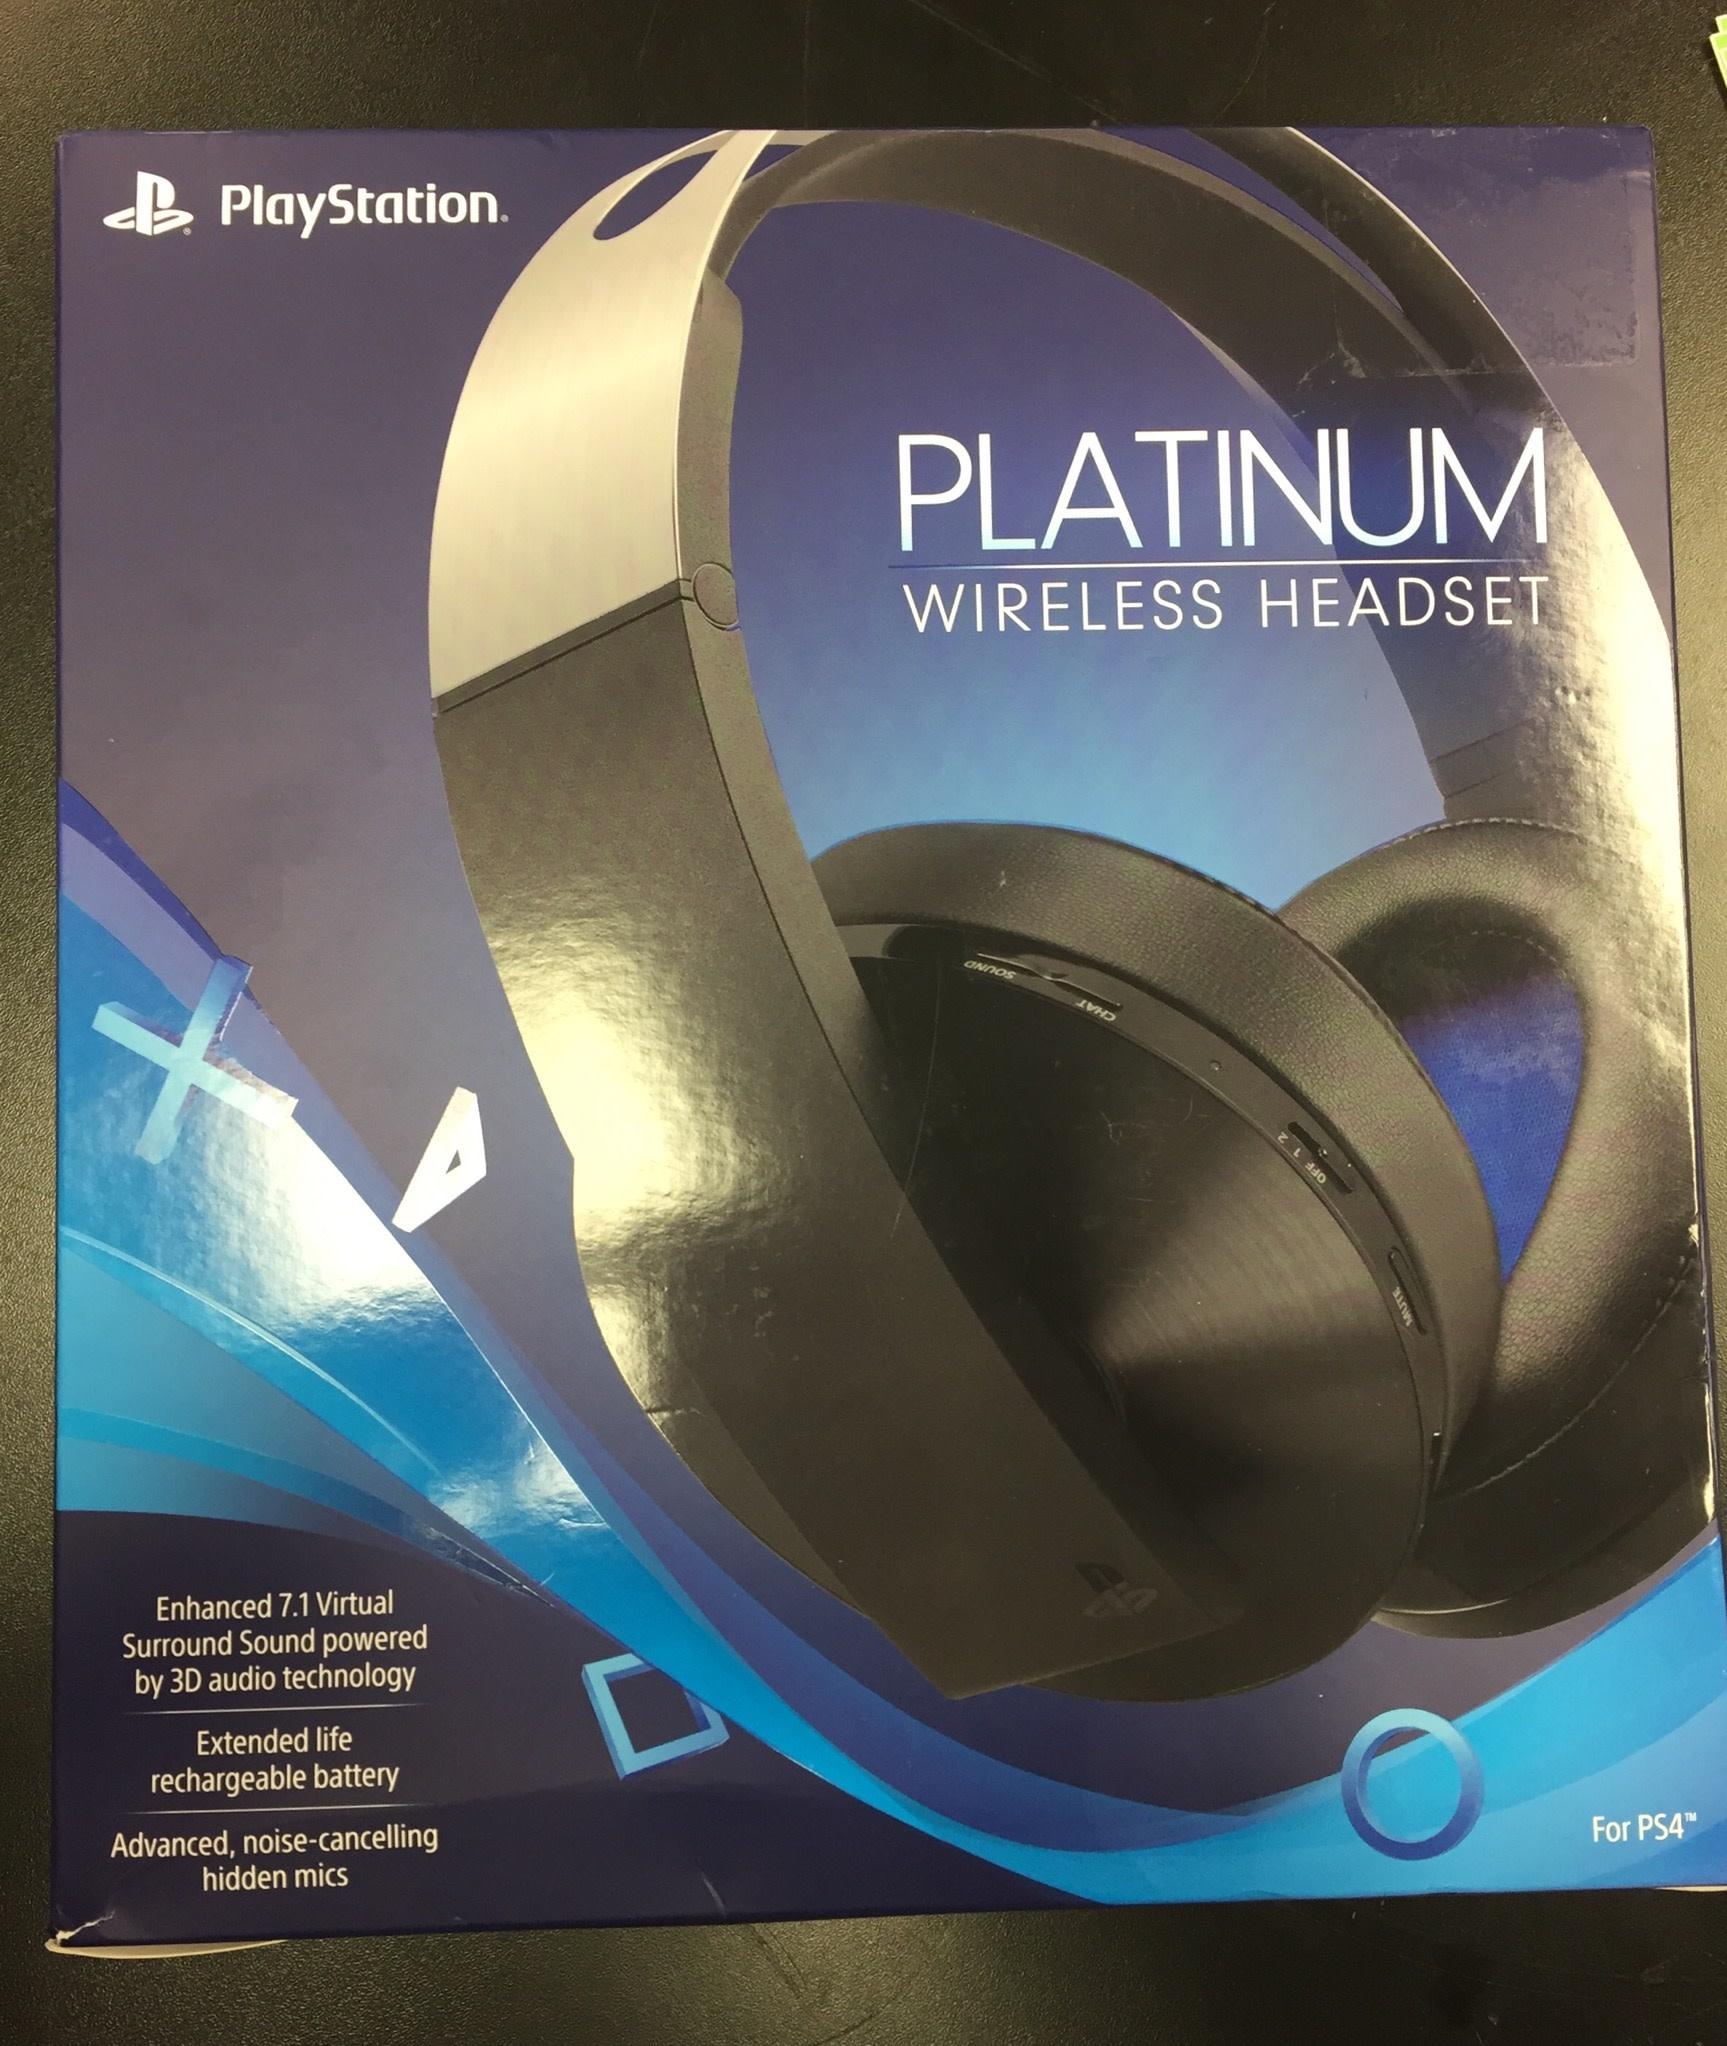 PlayStation 4 Platinum Wireless Headset - CECHYA-0090